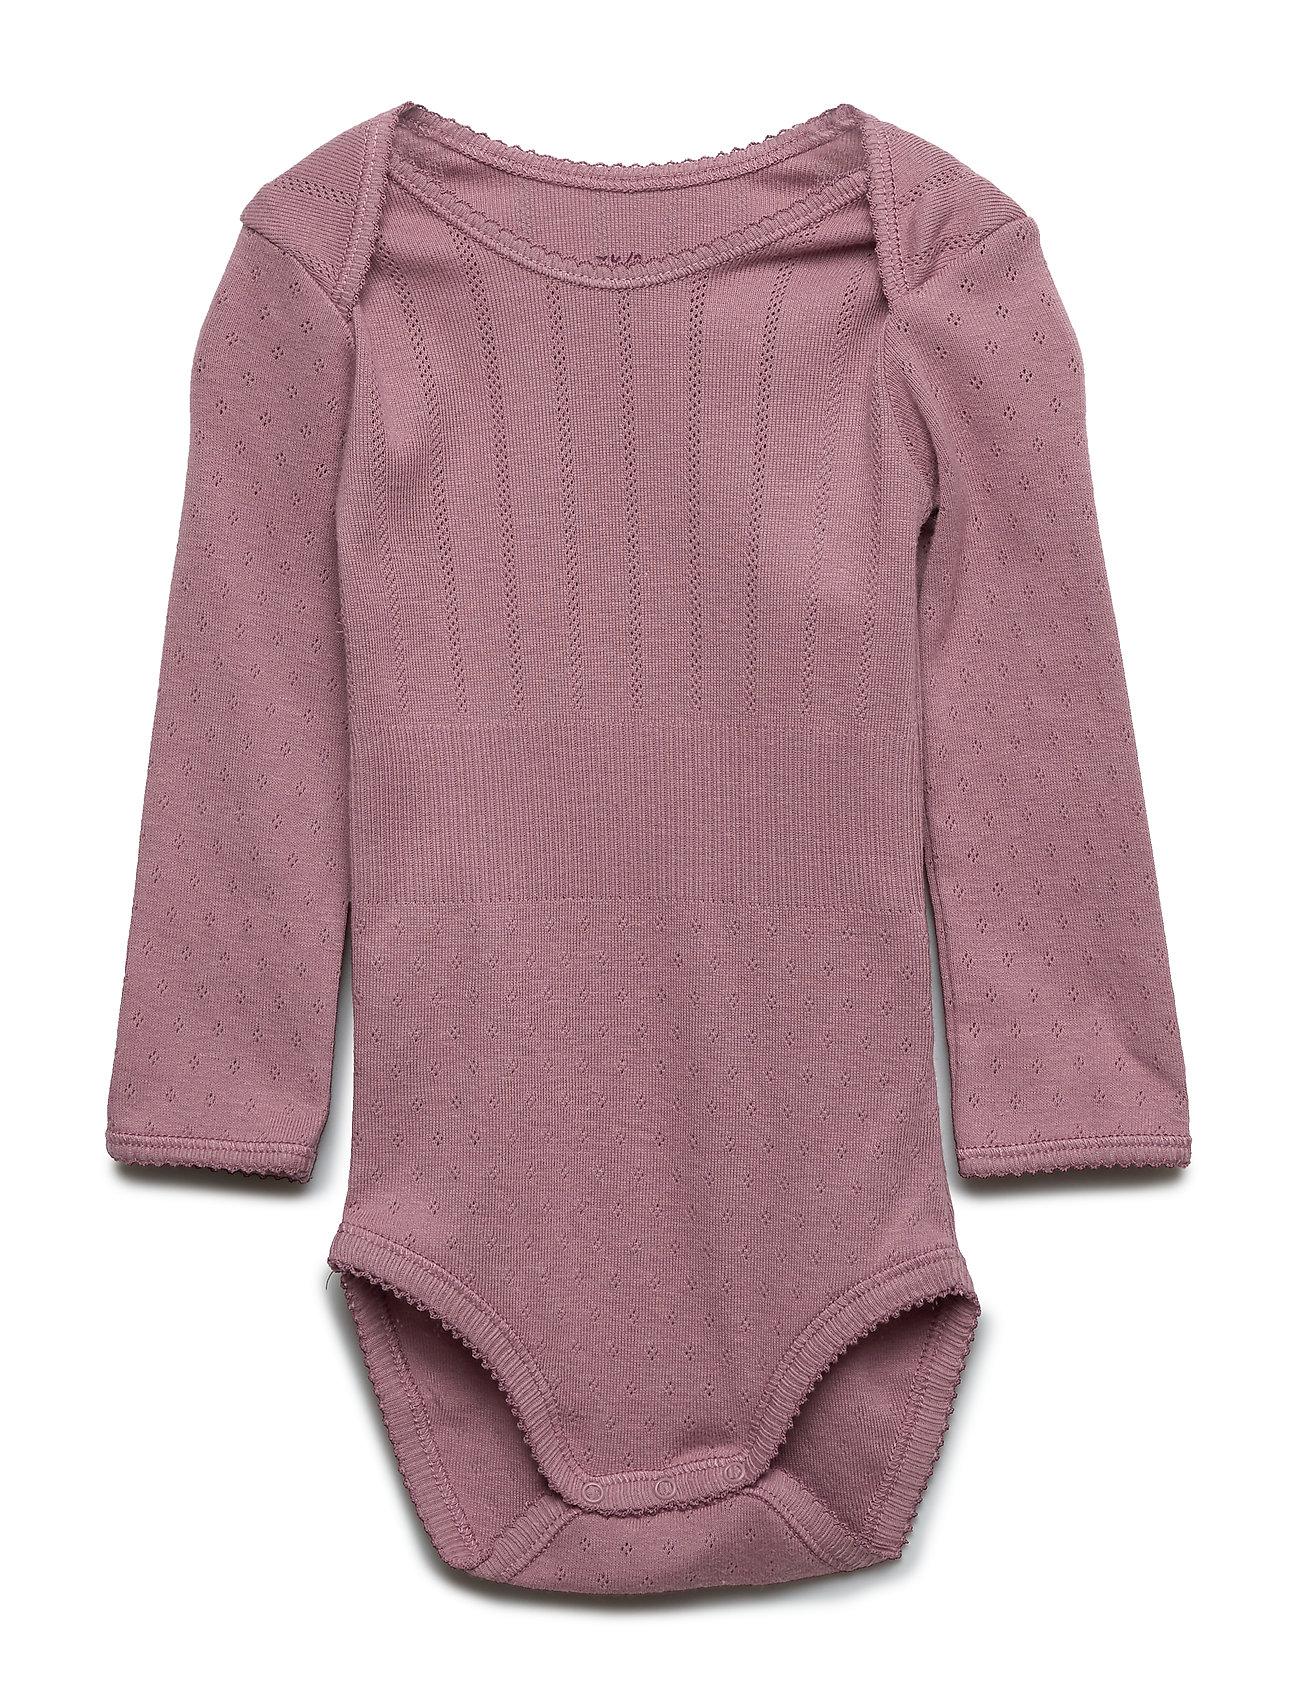 Noa Noa Miniature Baby Body - GRAPE SHAKE